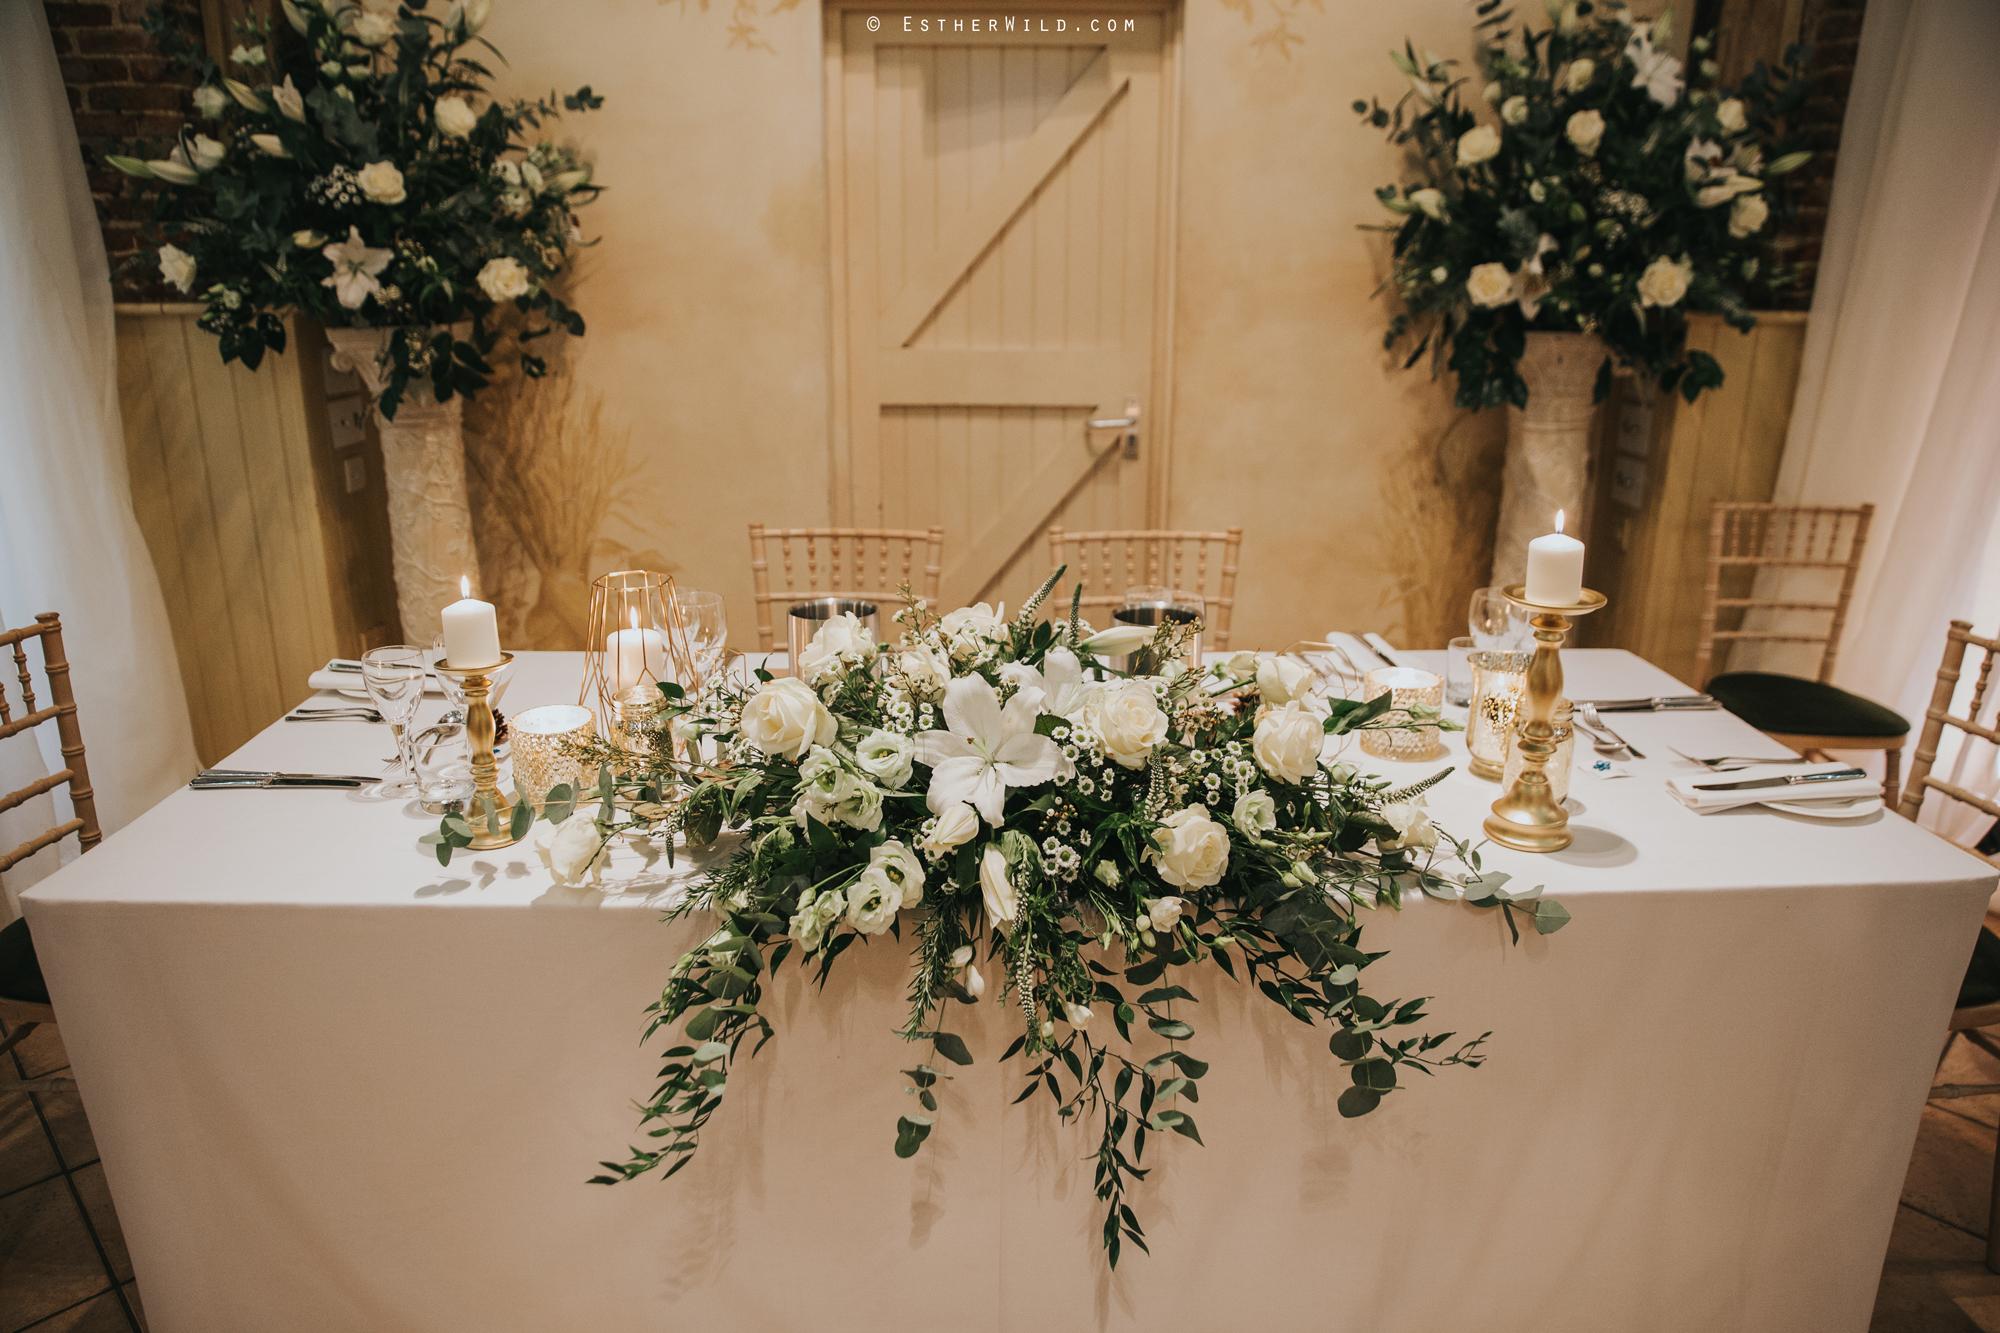 Elms_Barn_Weddings_Suffolk_Photographer_Copyright_Esther_Wild_IMG_2218.jpg